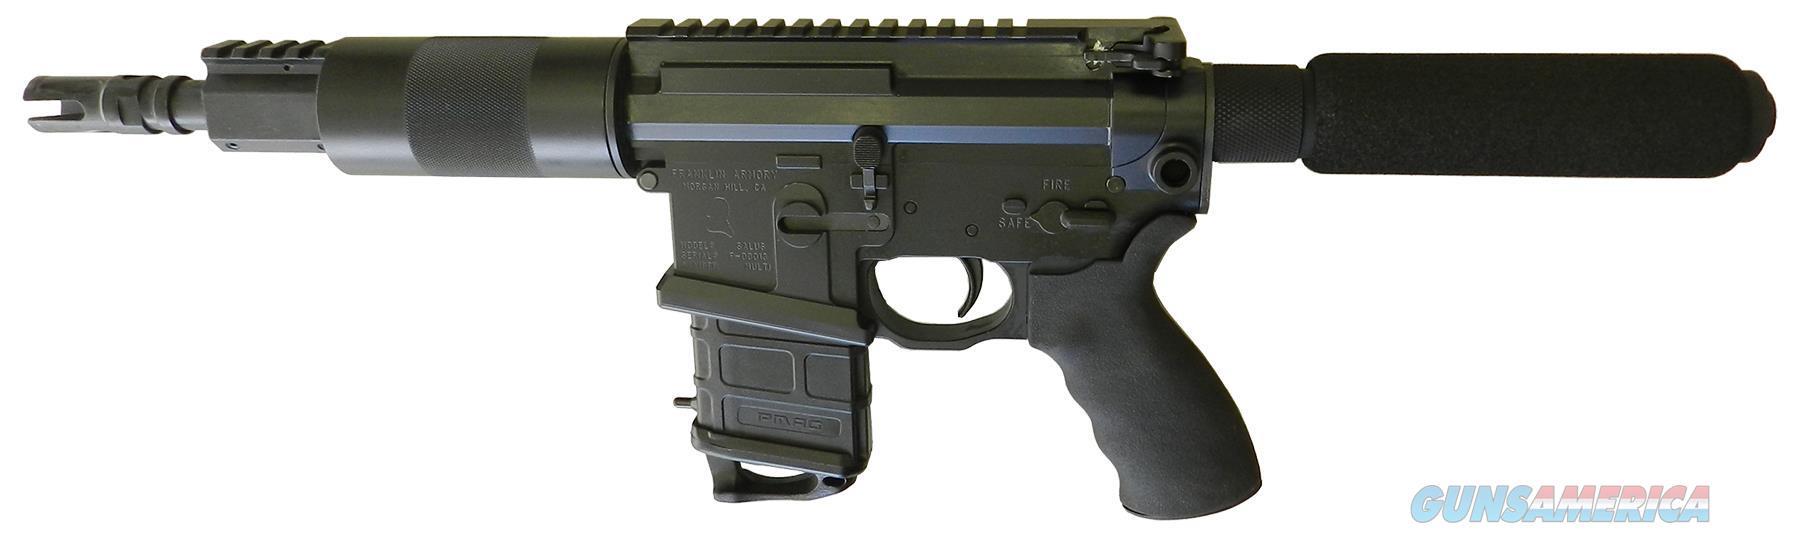 "Franklin Armory 3095 Salus 7.5"" Pistol Ar Pistol Semi-Automatic 223 Remington/5.56 Nato 7.5"" 30+1 Black 3095  Guns > Pistols > F Misc Pistols"